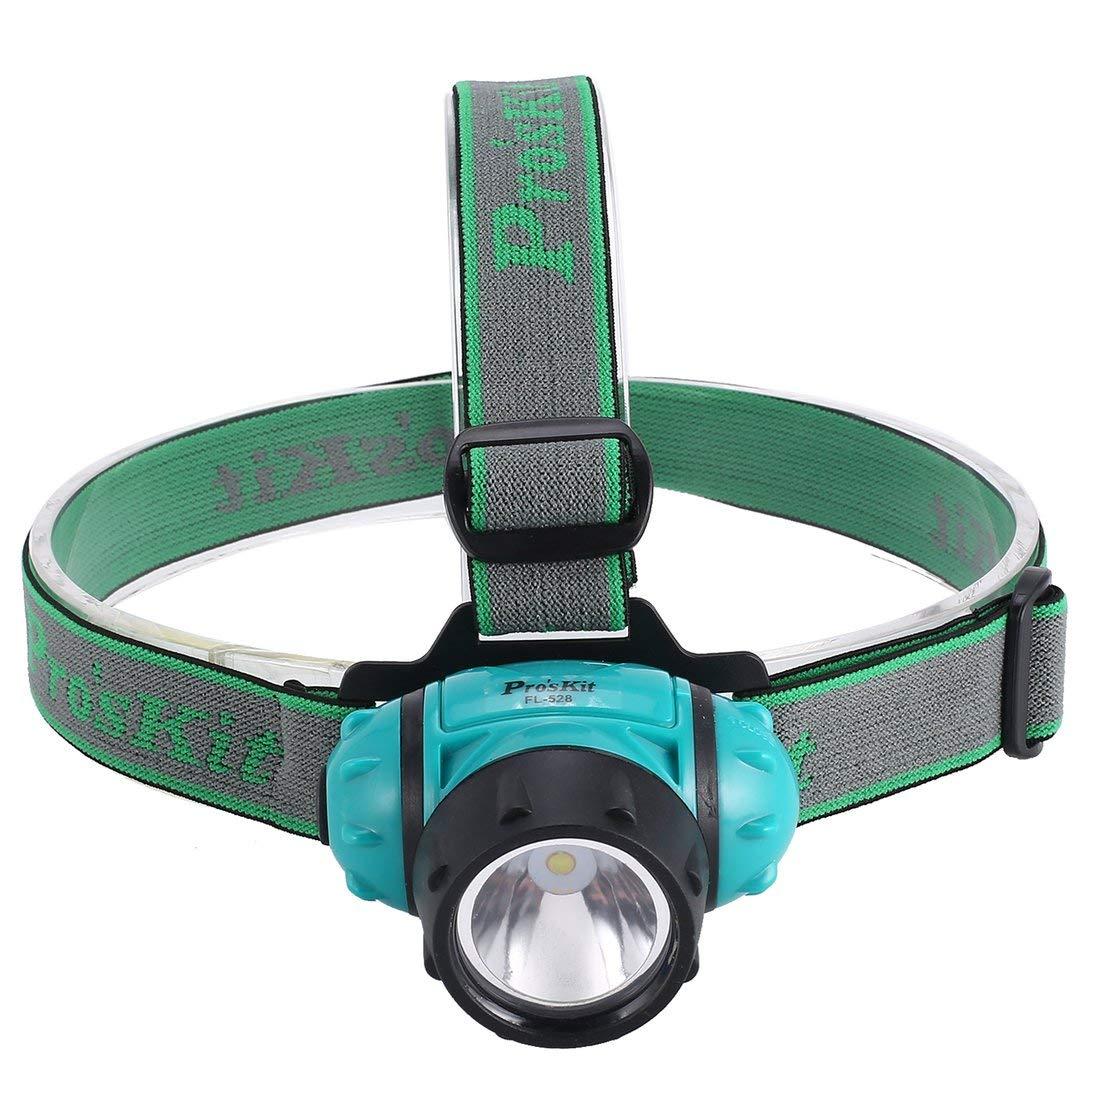 Nueva Pro'sKit FL-528 LED Linterna Linterna Reparació n Automá tica Herramienta Taller Ajustable Iluminació n Portá til Lá mpara de Luz de Trabajo Laurelmartina